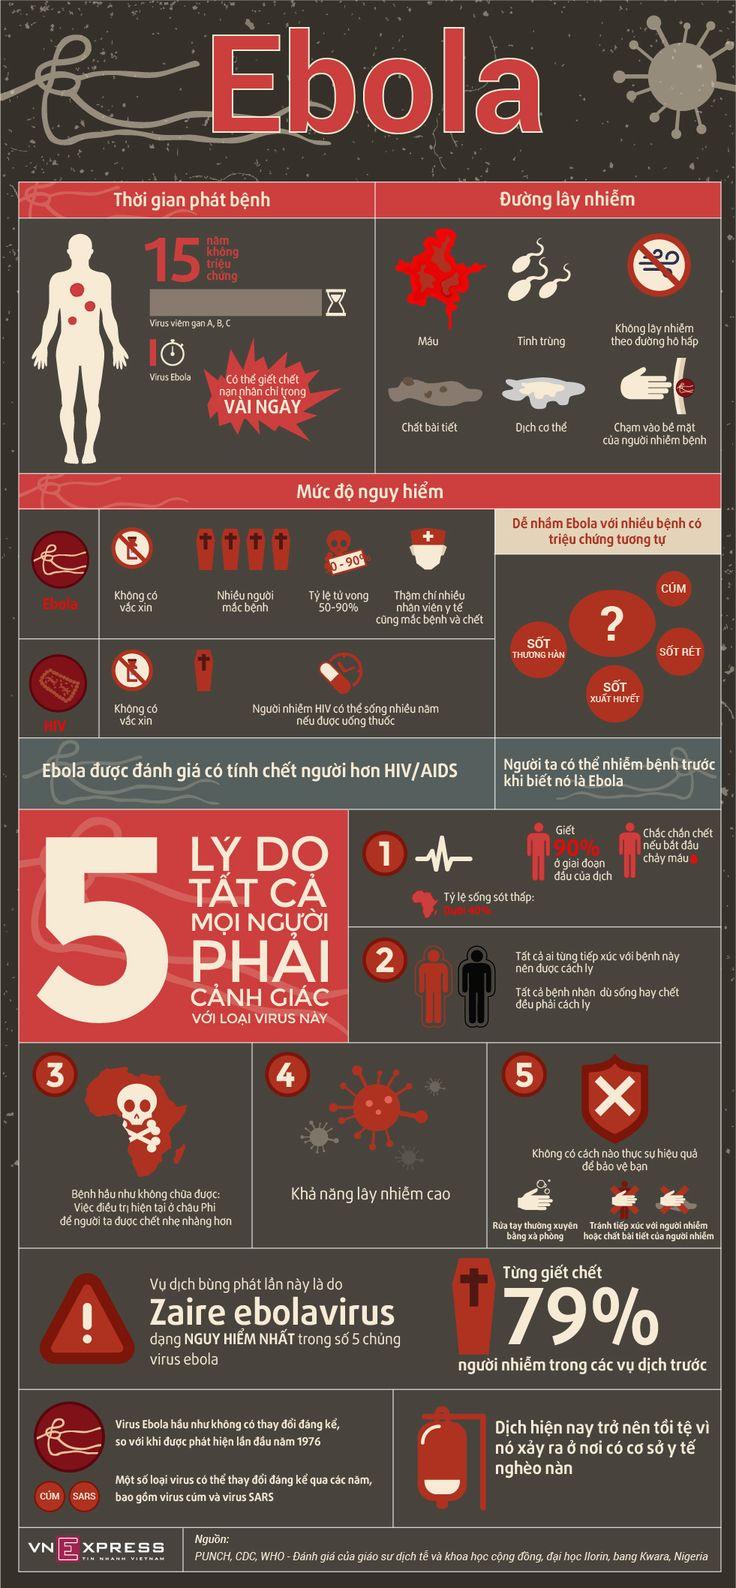 Virus Ebola Nguy Hiểm thế nào ?